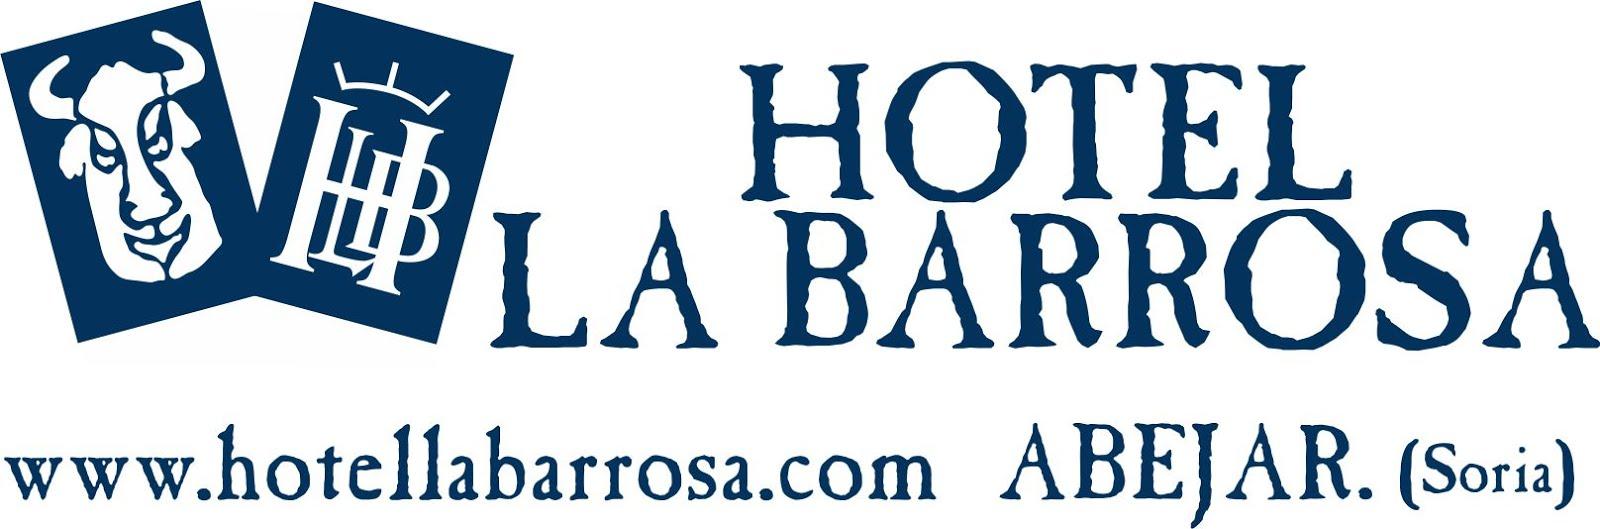 Hotel La Barrosa